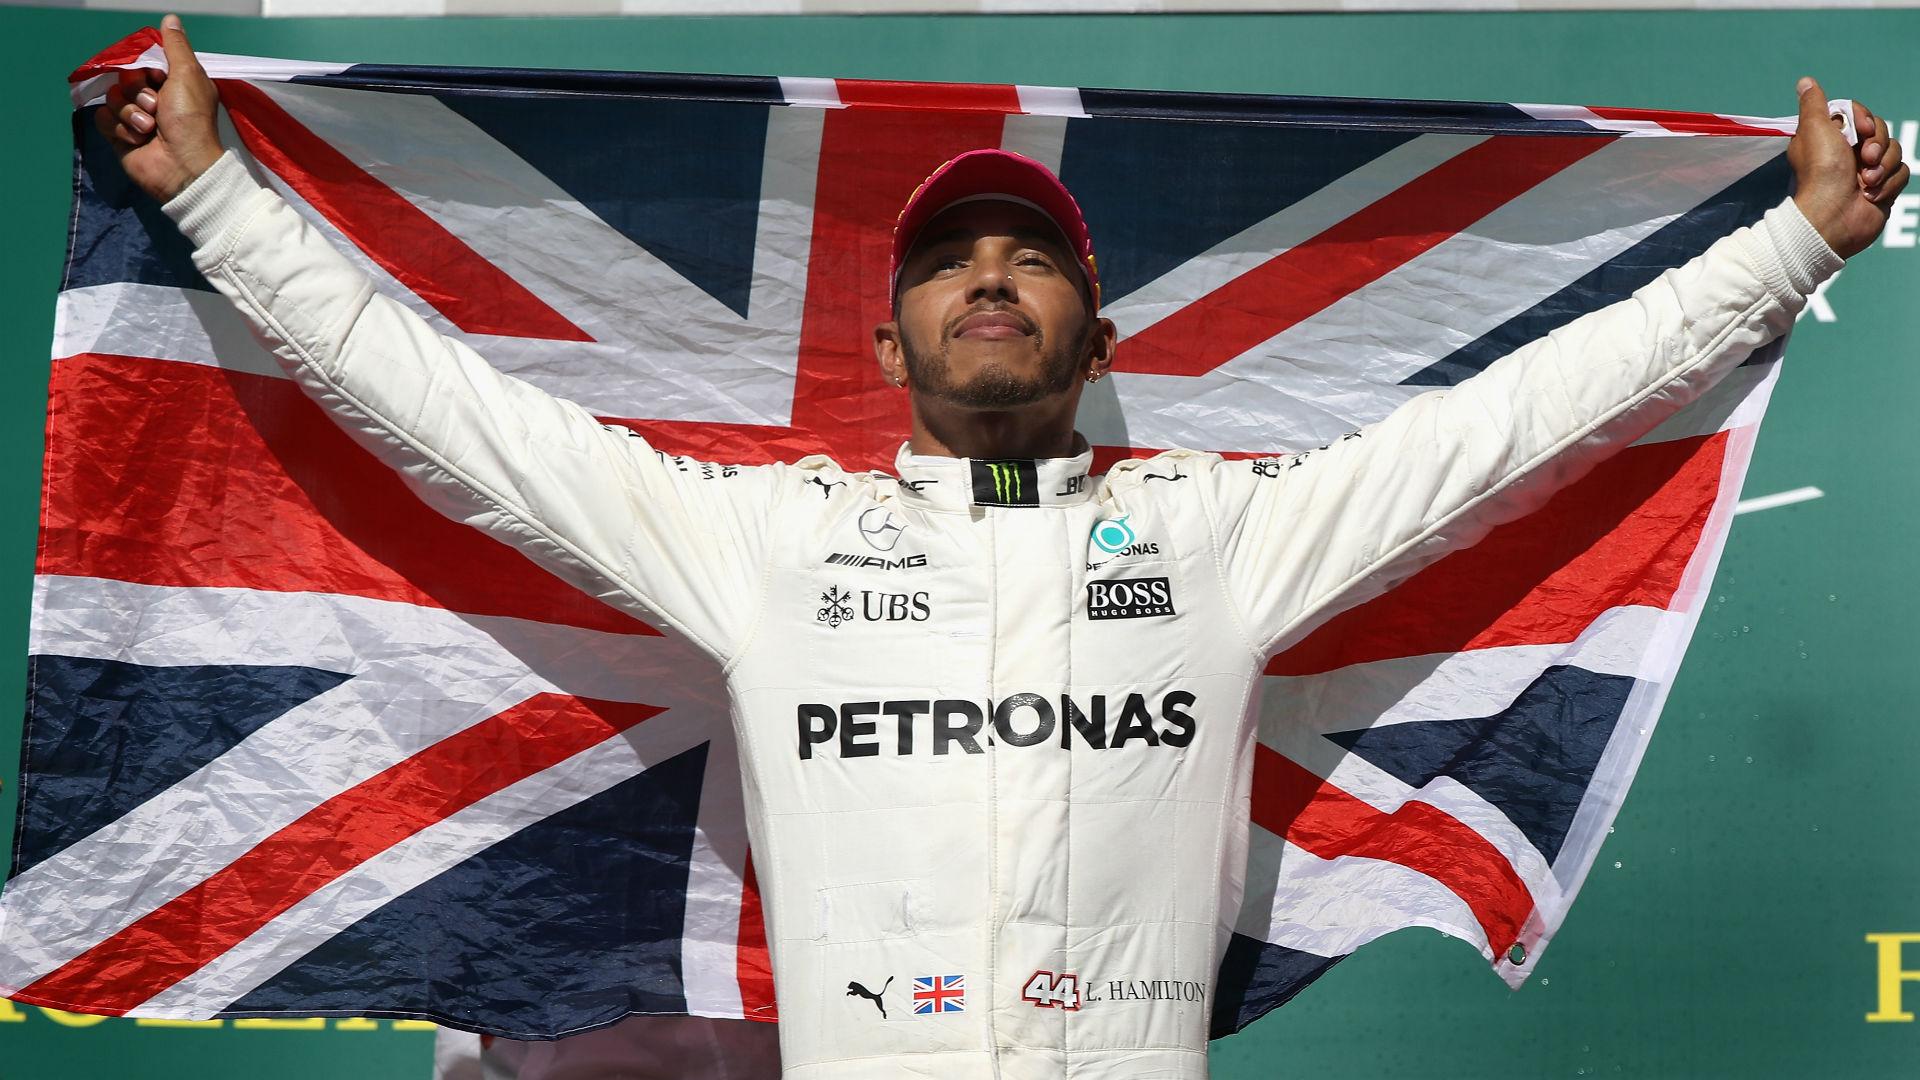 Lewis Hamilton wins fourth F1 title despite first-lap collision with Sebastian Vettel